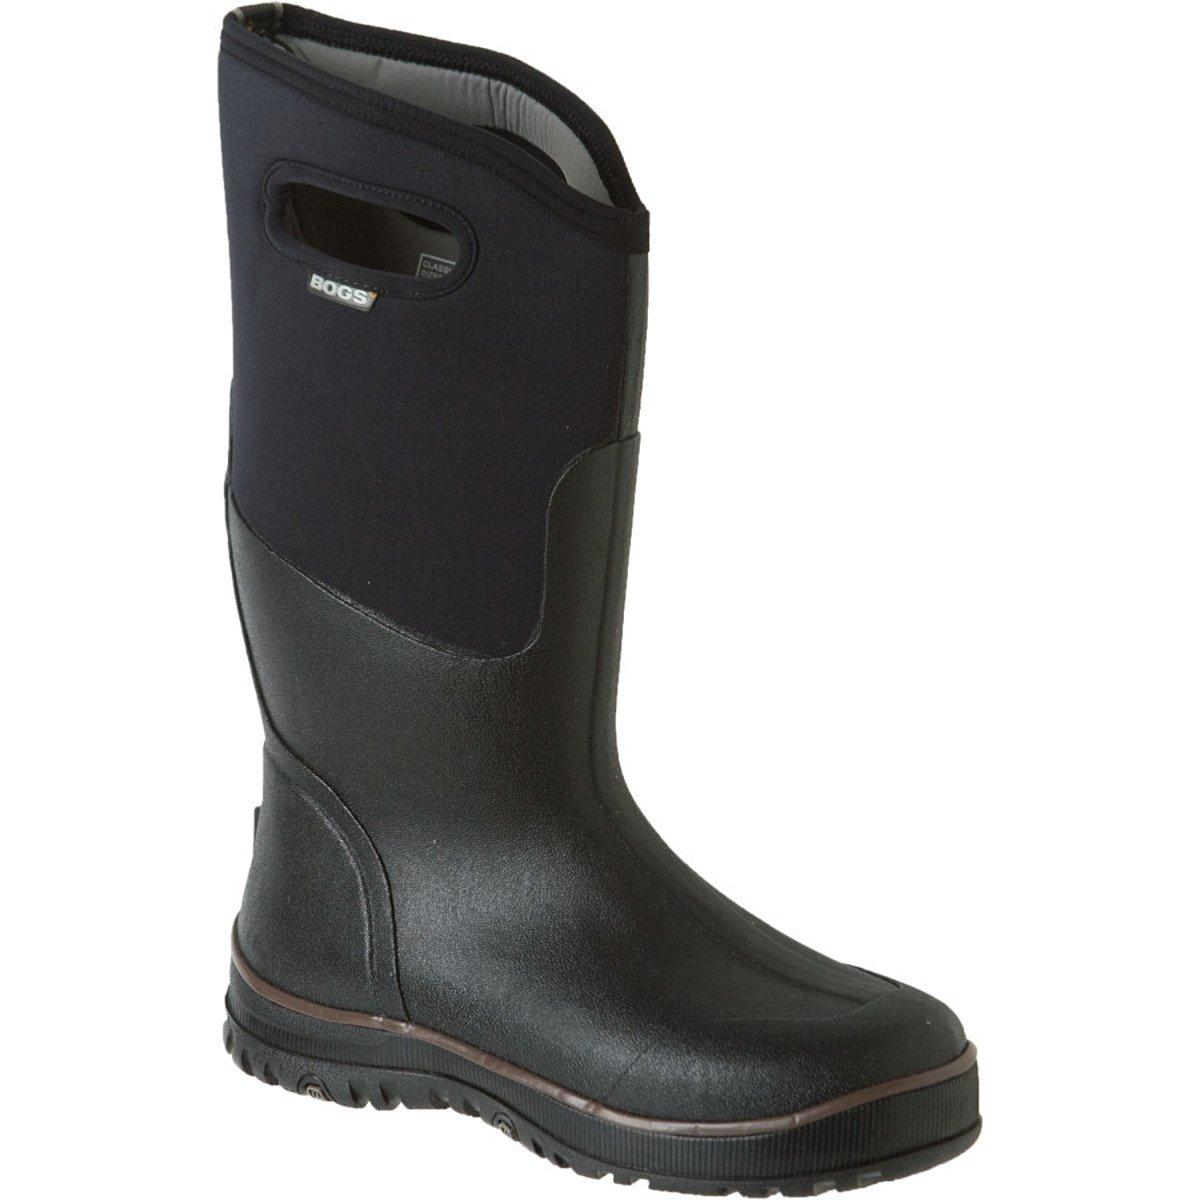 Bogs Men's Ultra High Insulated Waterproof Winter Boots - 13 D(M) US - Black